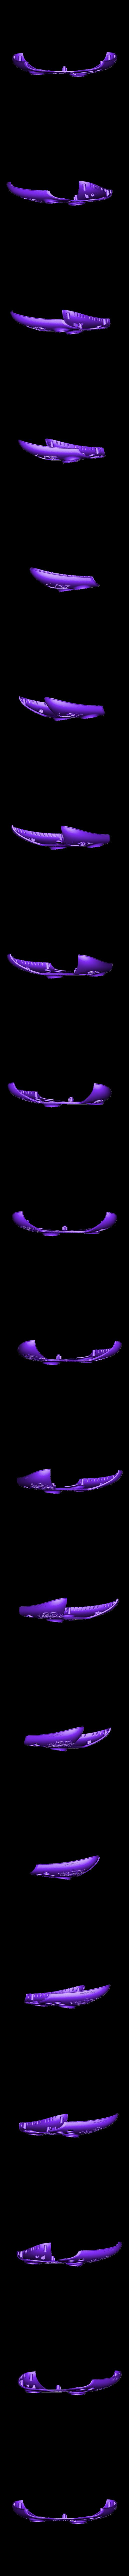 Fortnite_Controller_4_DRIFT.stl Download free STL file Custom Fortnite Xbox One S Controller • 3D printable design, mmjames